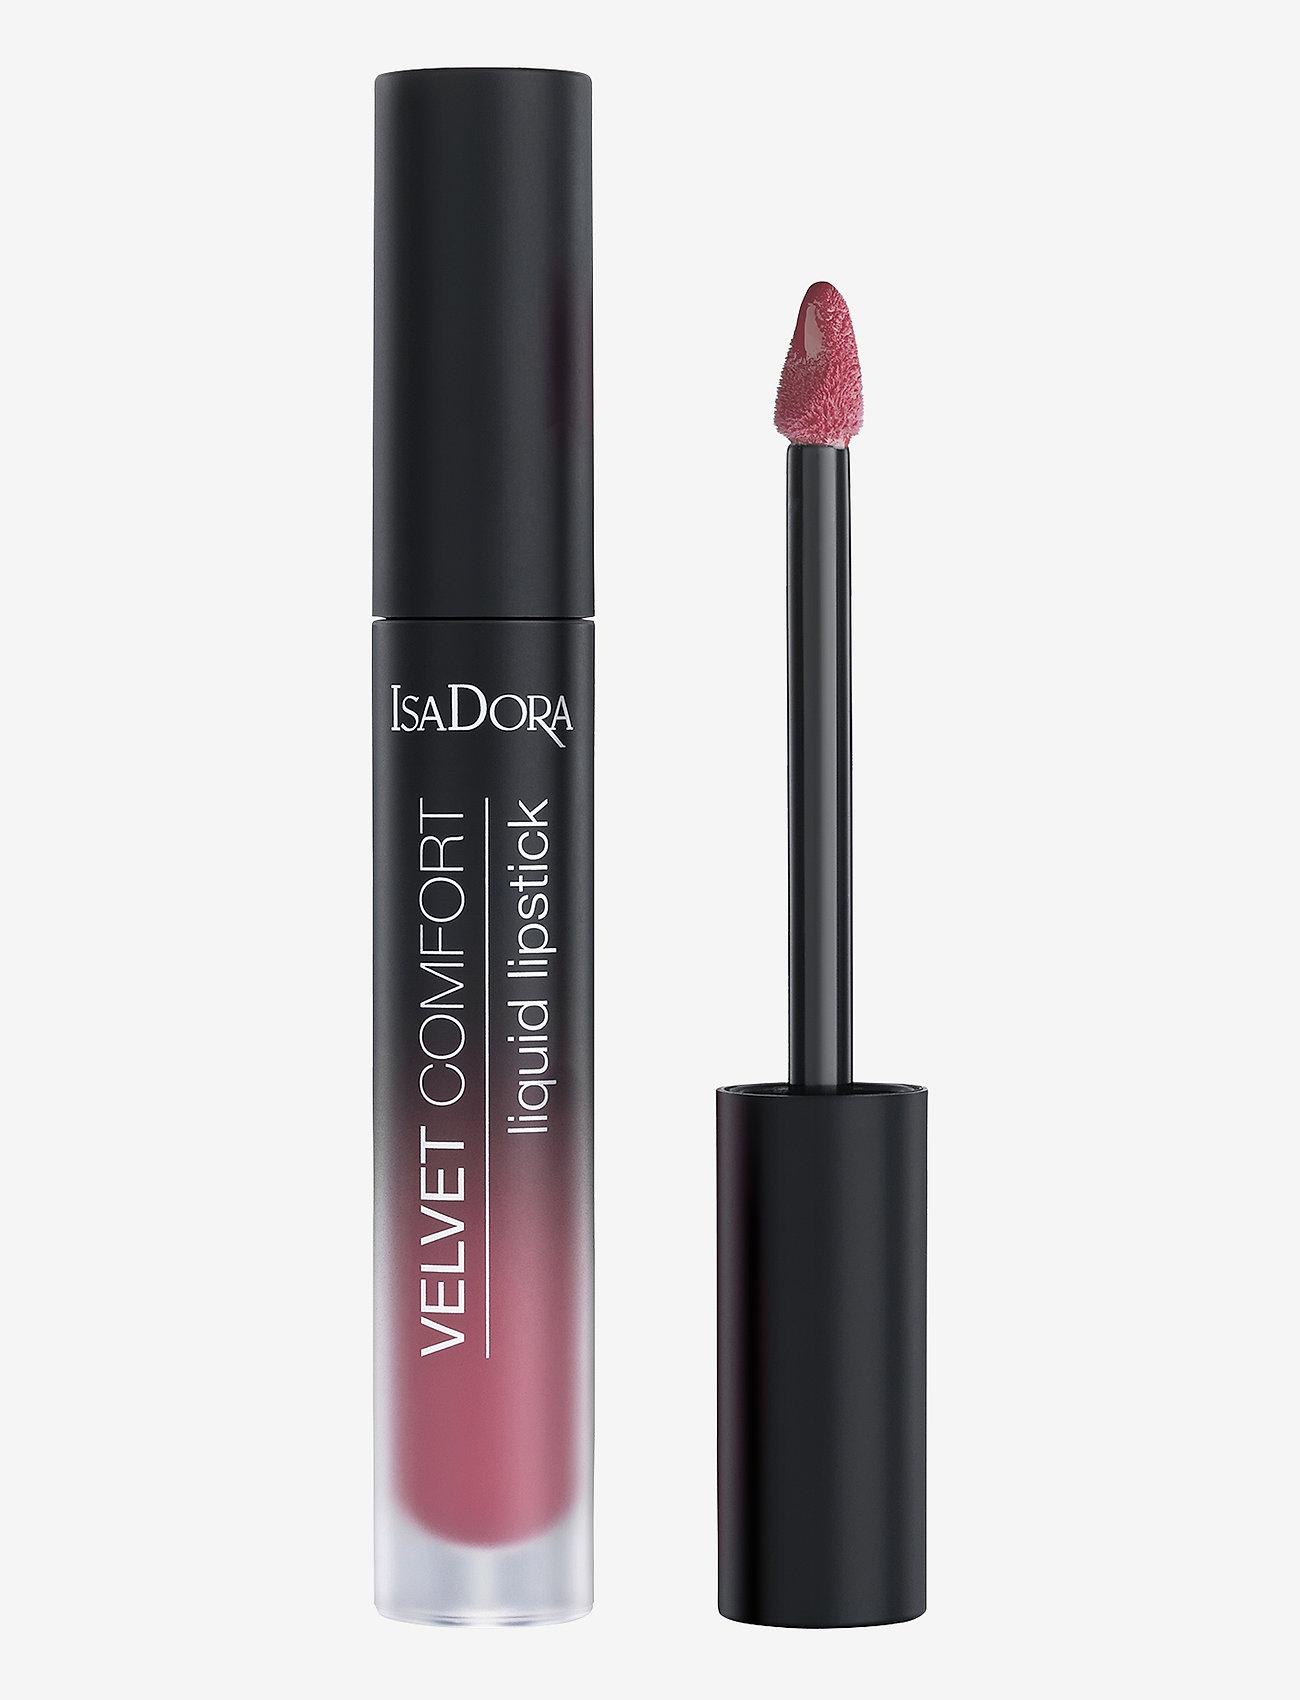 Isadora - Velvet Comfort Liquid Lipstick Mauve Pink - liquid lipstick - mauve pink - 1